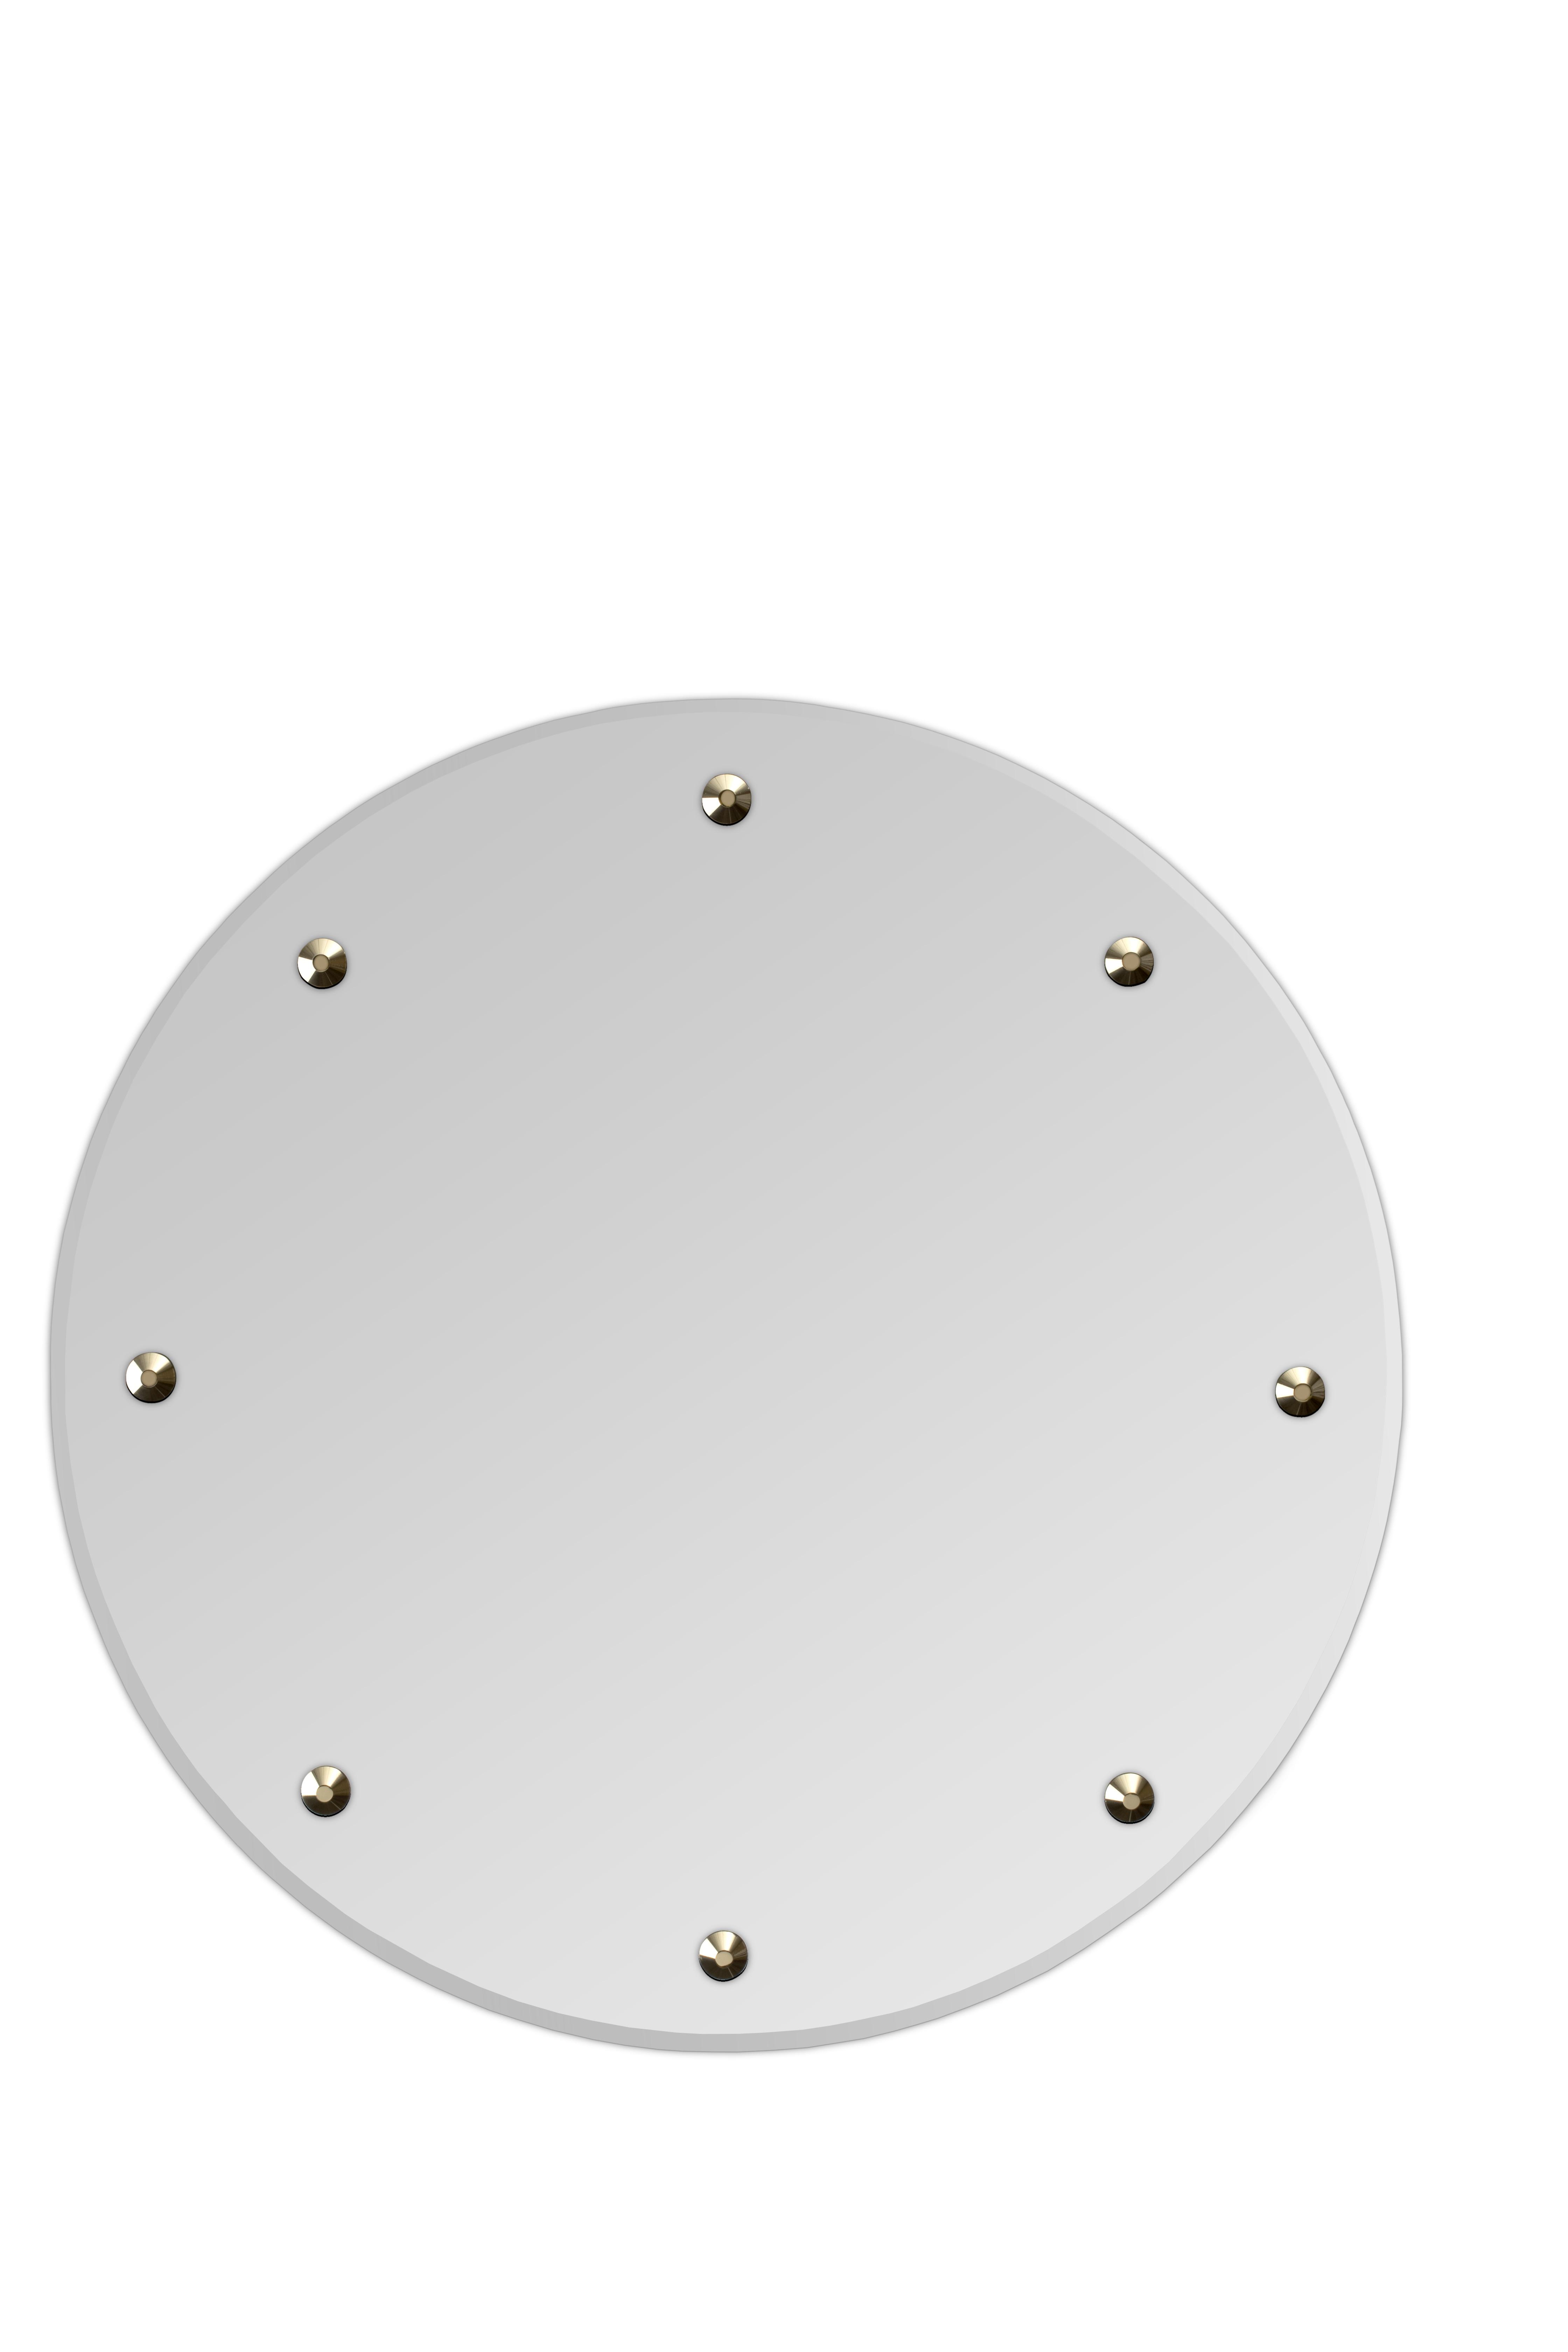 Bathroom Mirrors To Get A Luxurious Decor bathroom mirrors Bathroom Mirrors To Get A Luxurious Decor glimmer mirror 1 HR